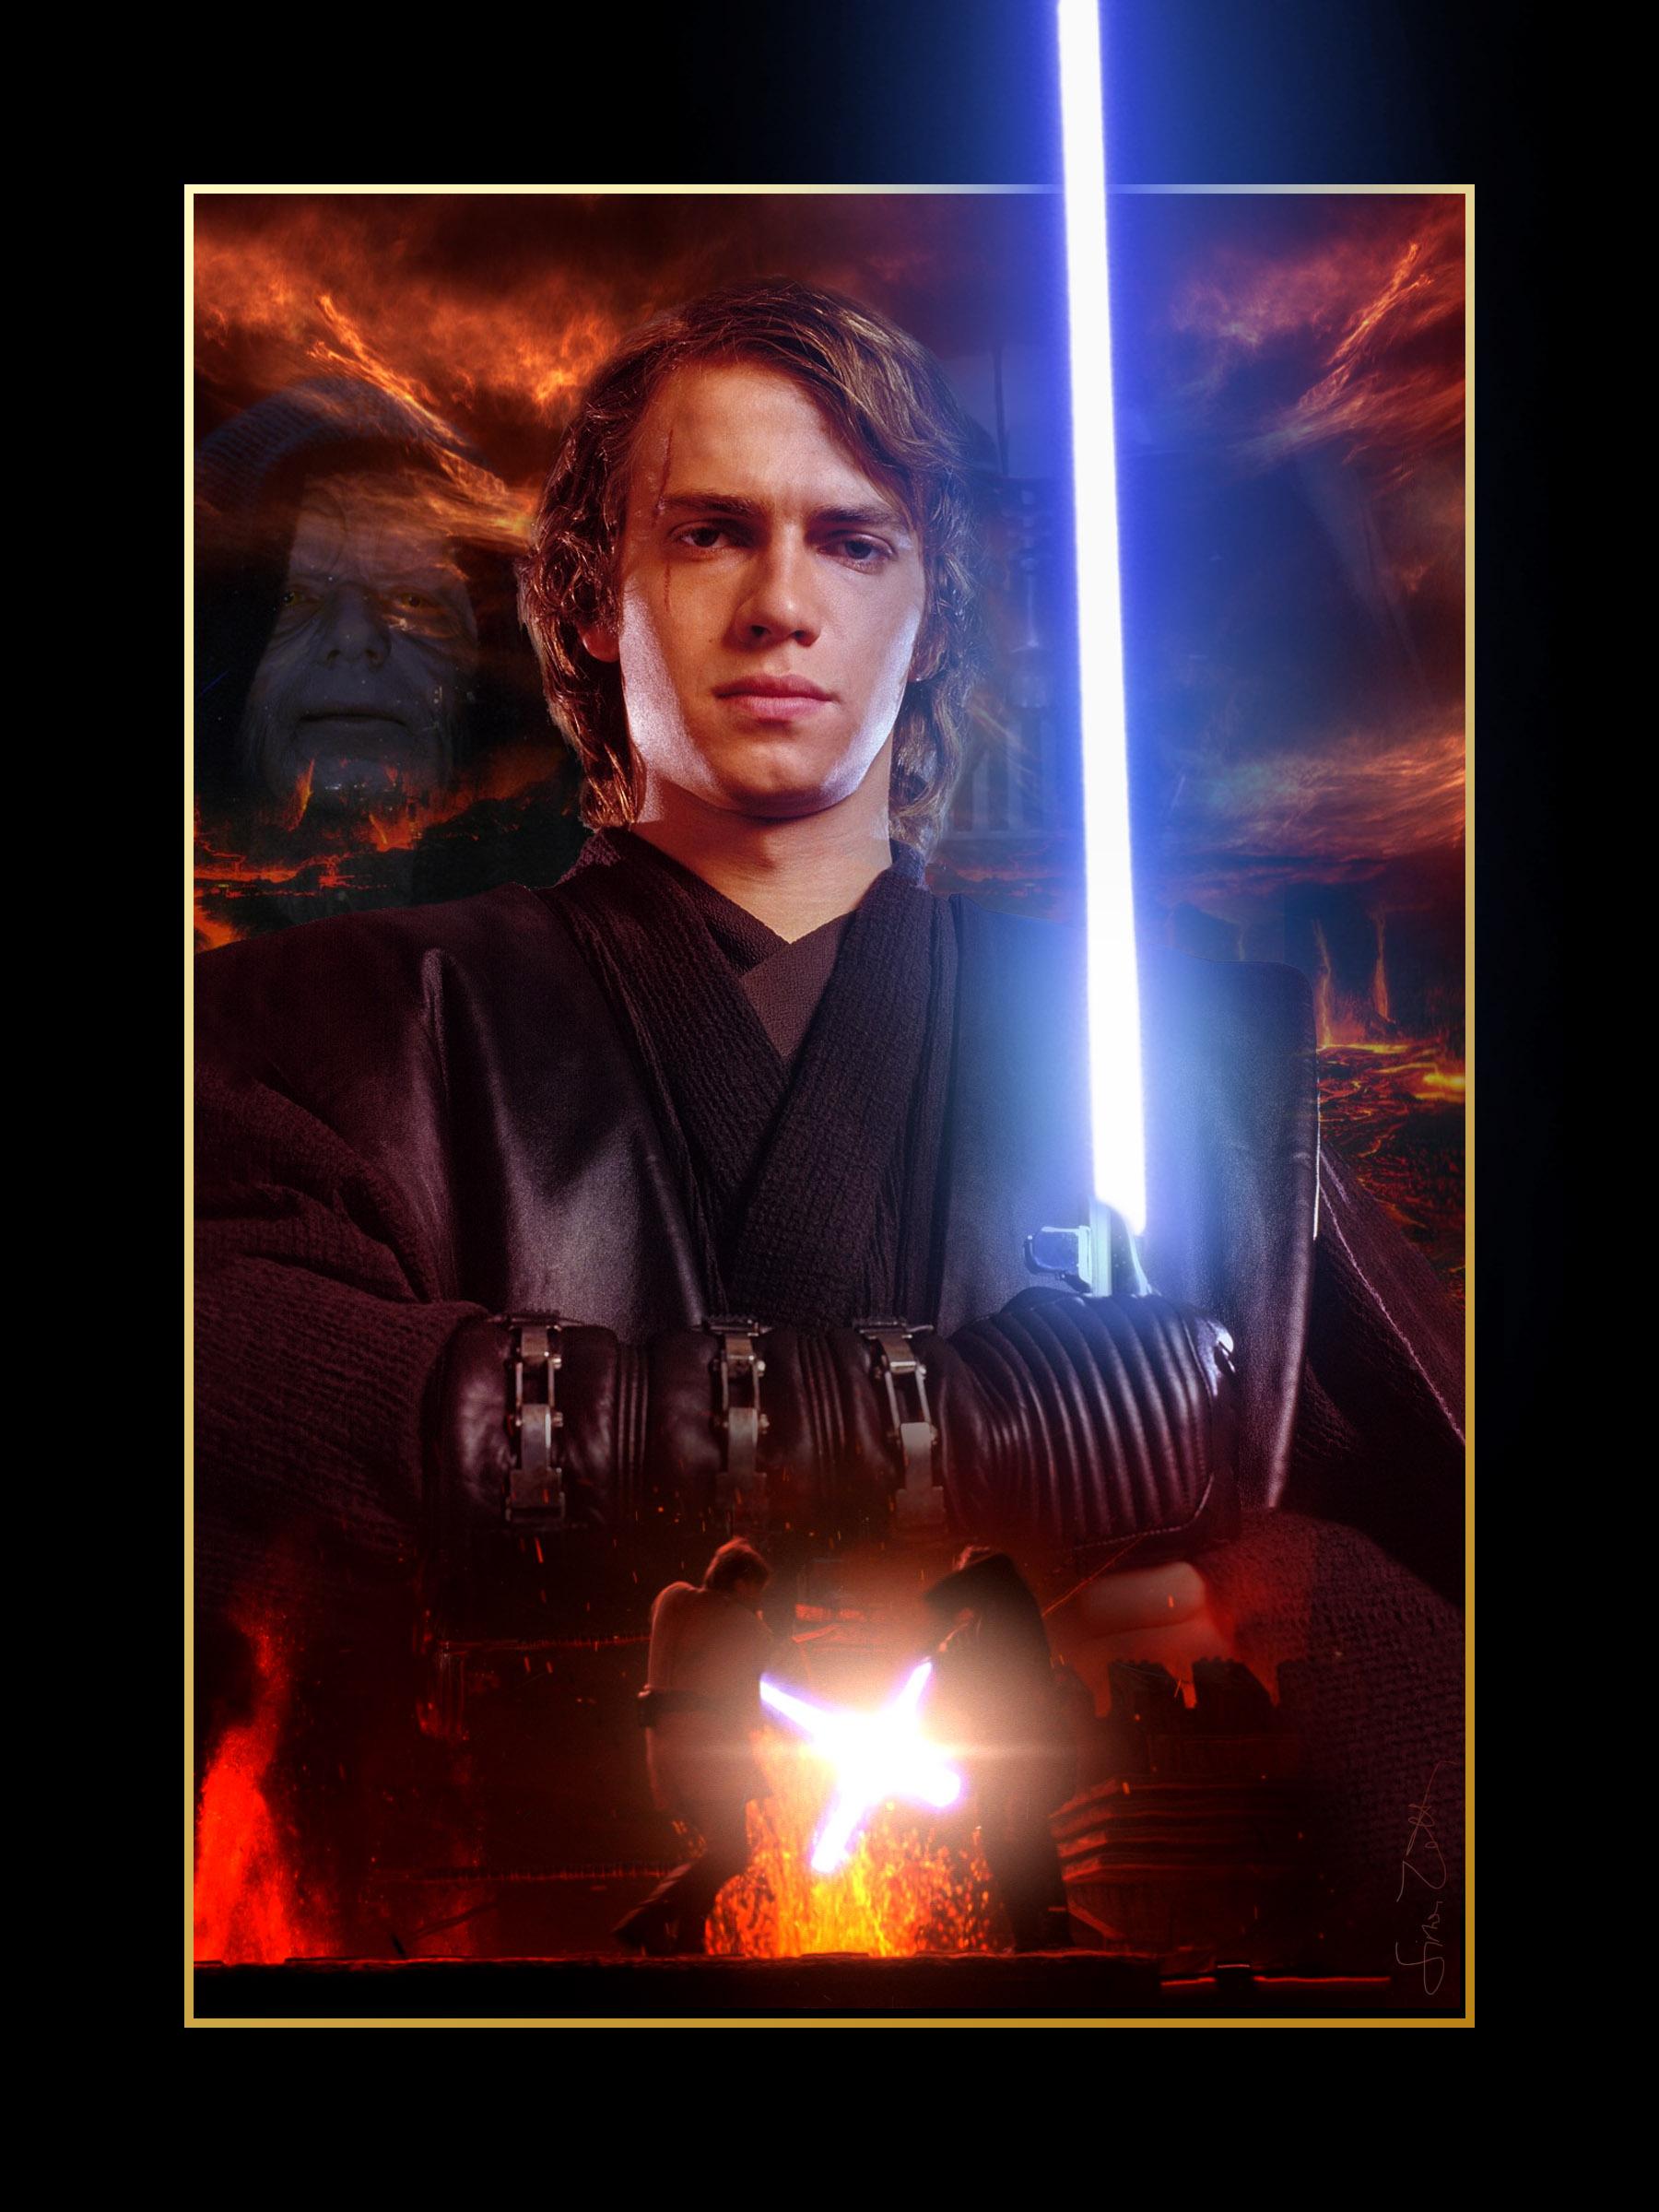 Anakin Skywalker And Mace Windu Hayden Christensen Jake Lloyd 1249174 Hd Wallpaper Backgrounds Download